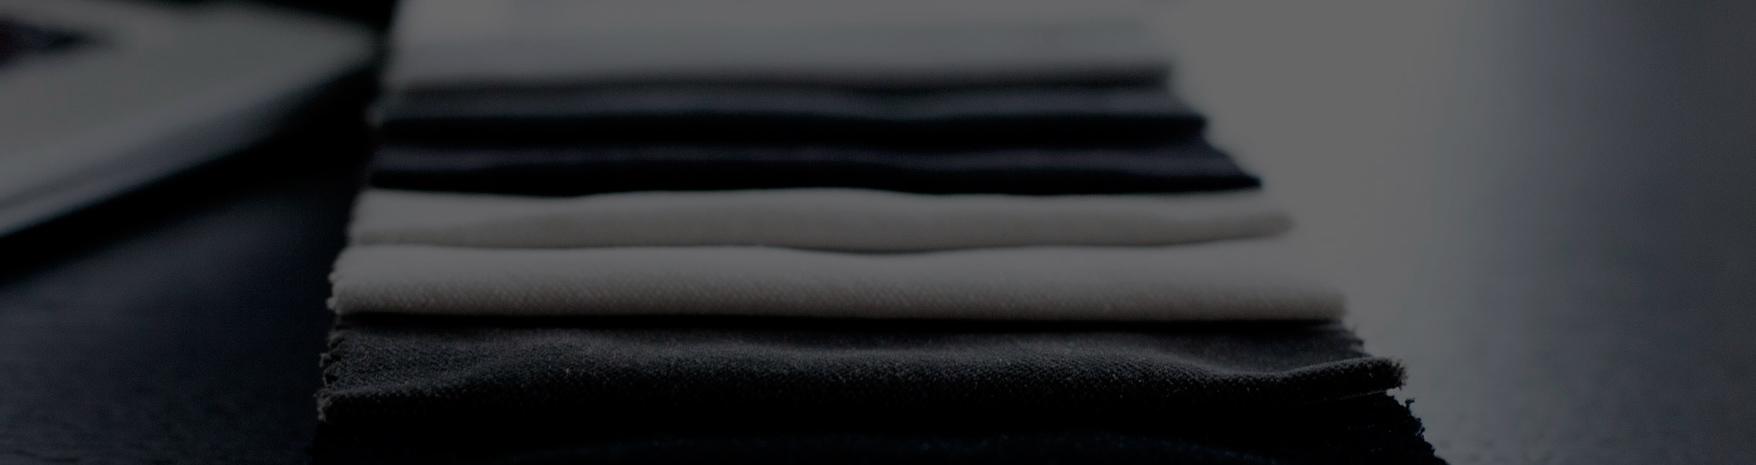 imedia-fabric